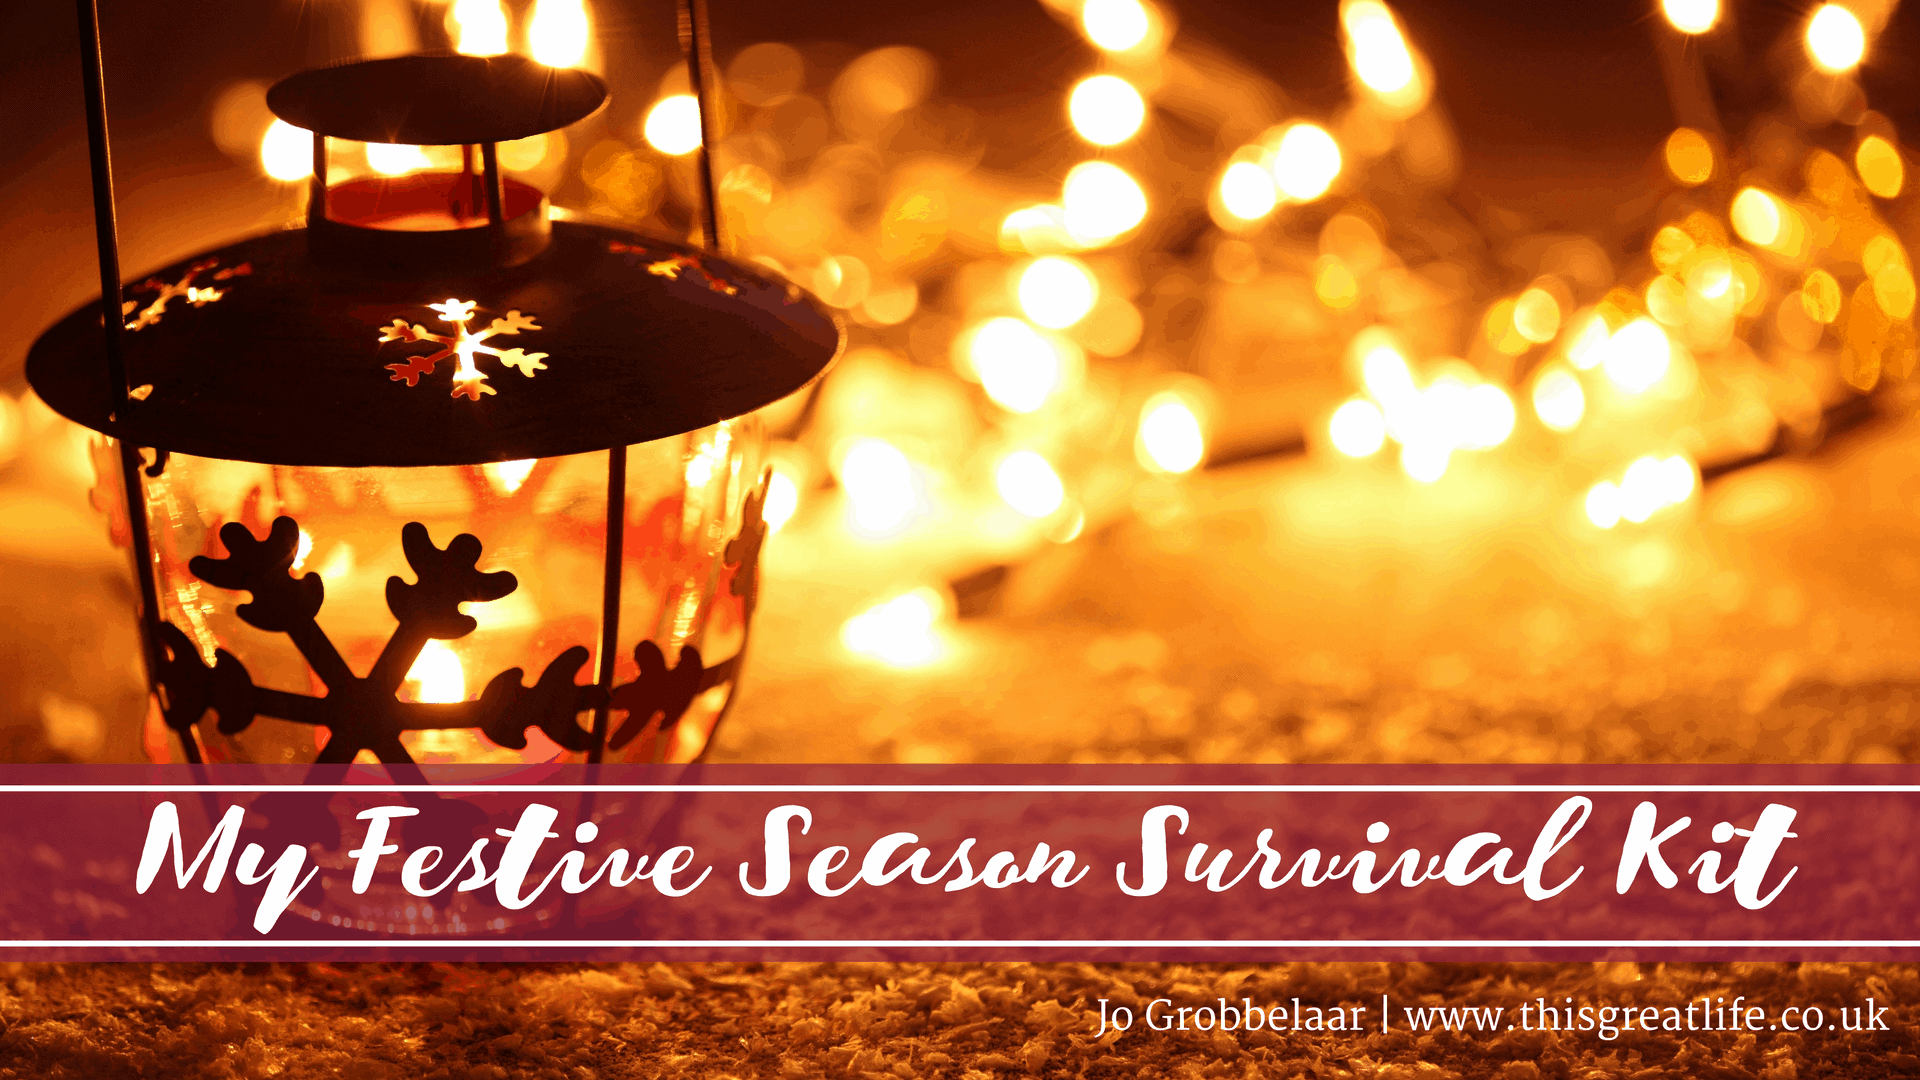 My Festive Season Survival Kit